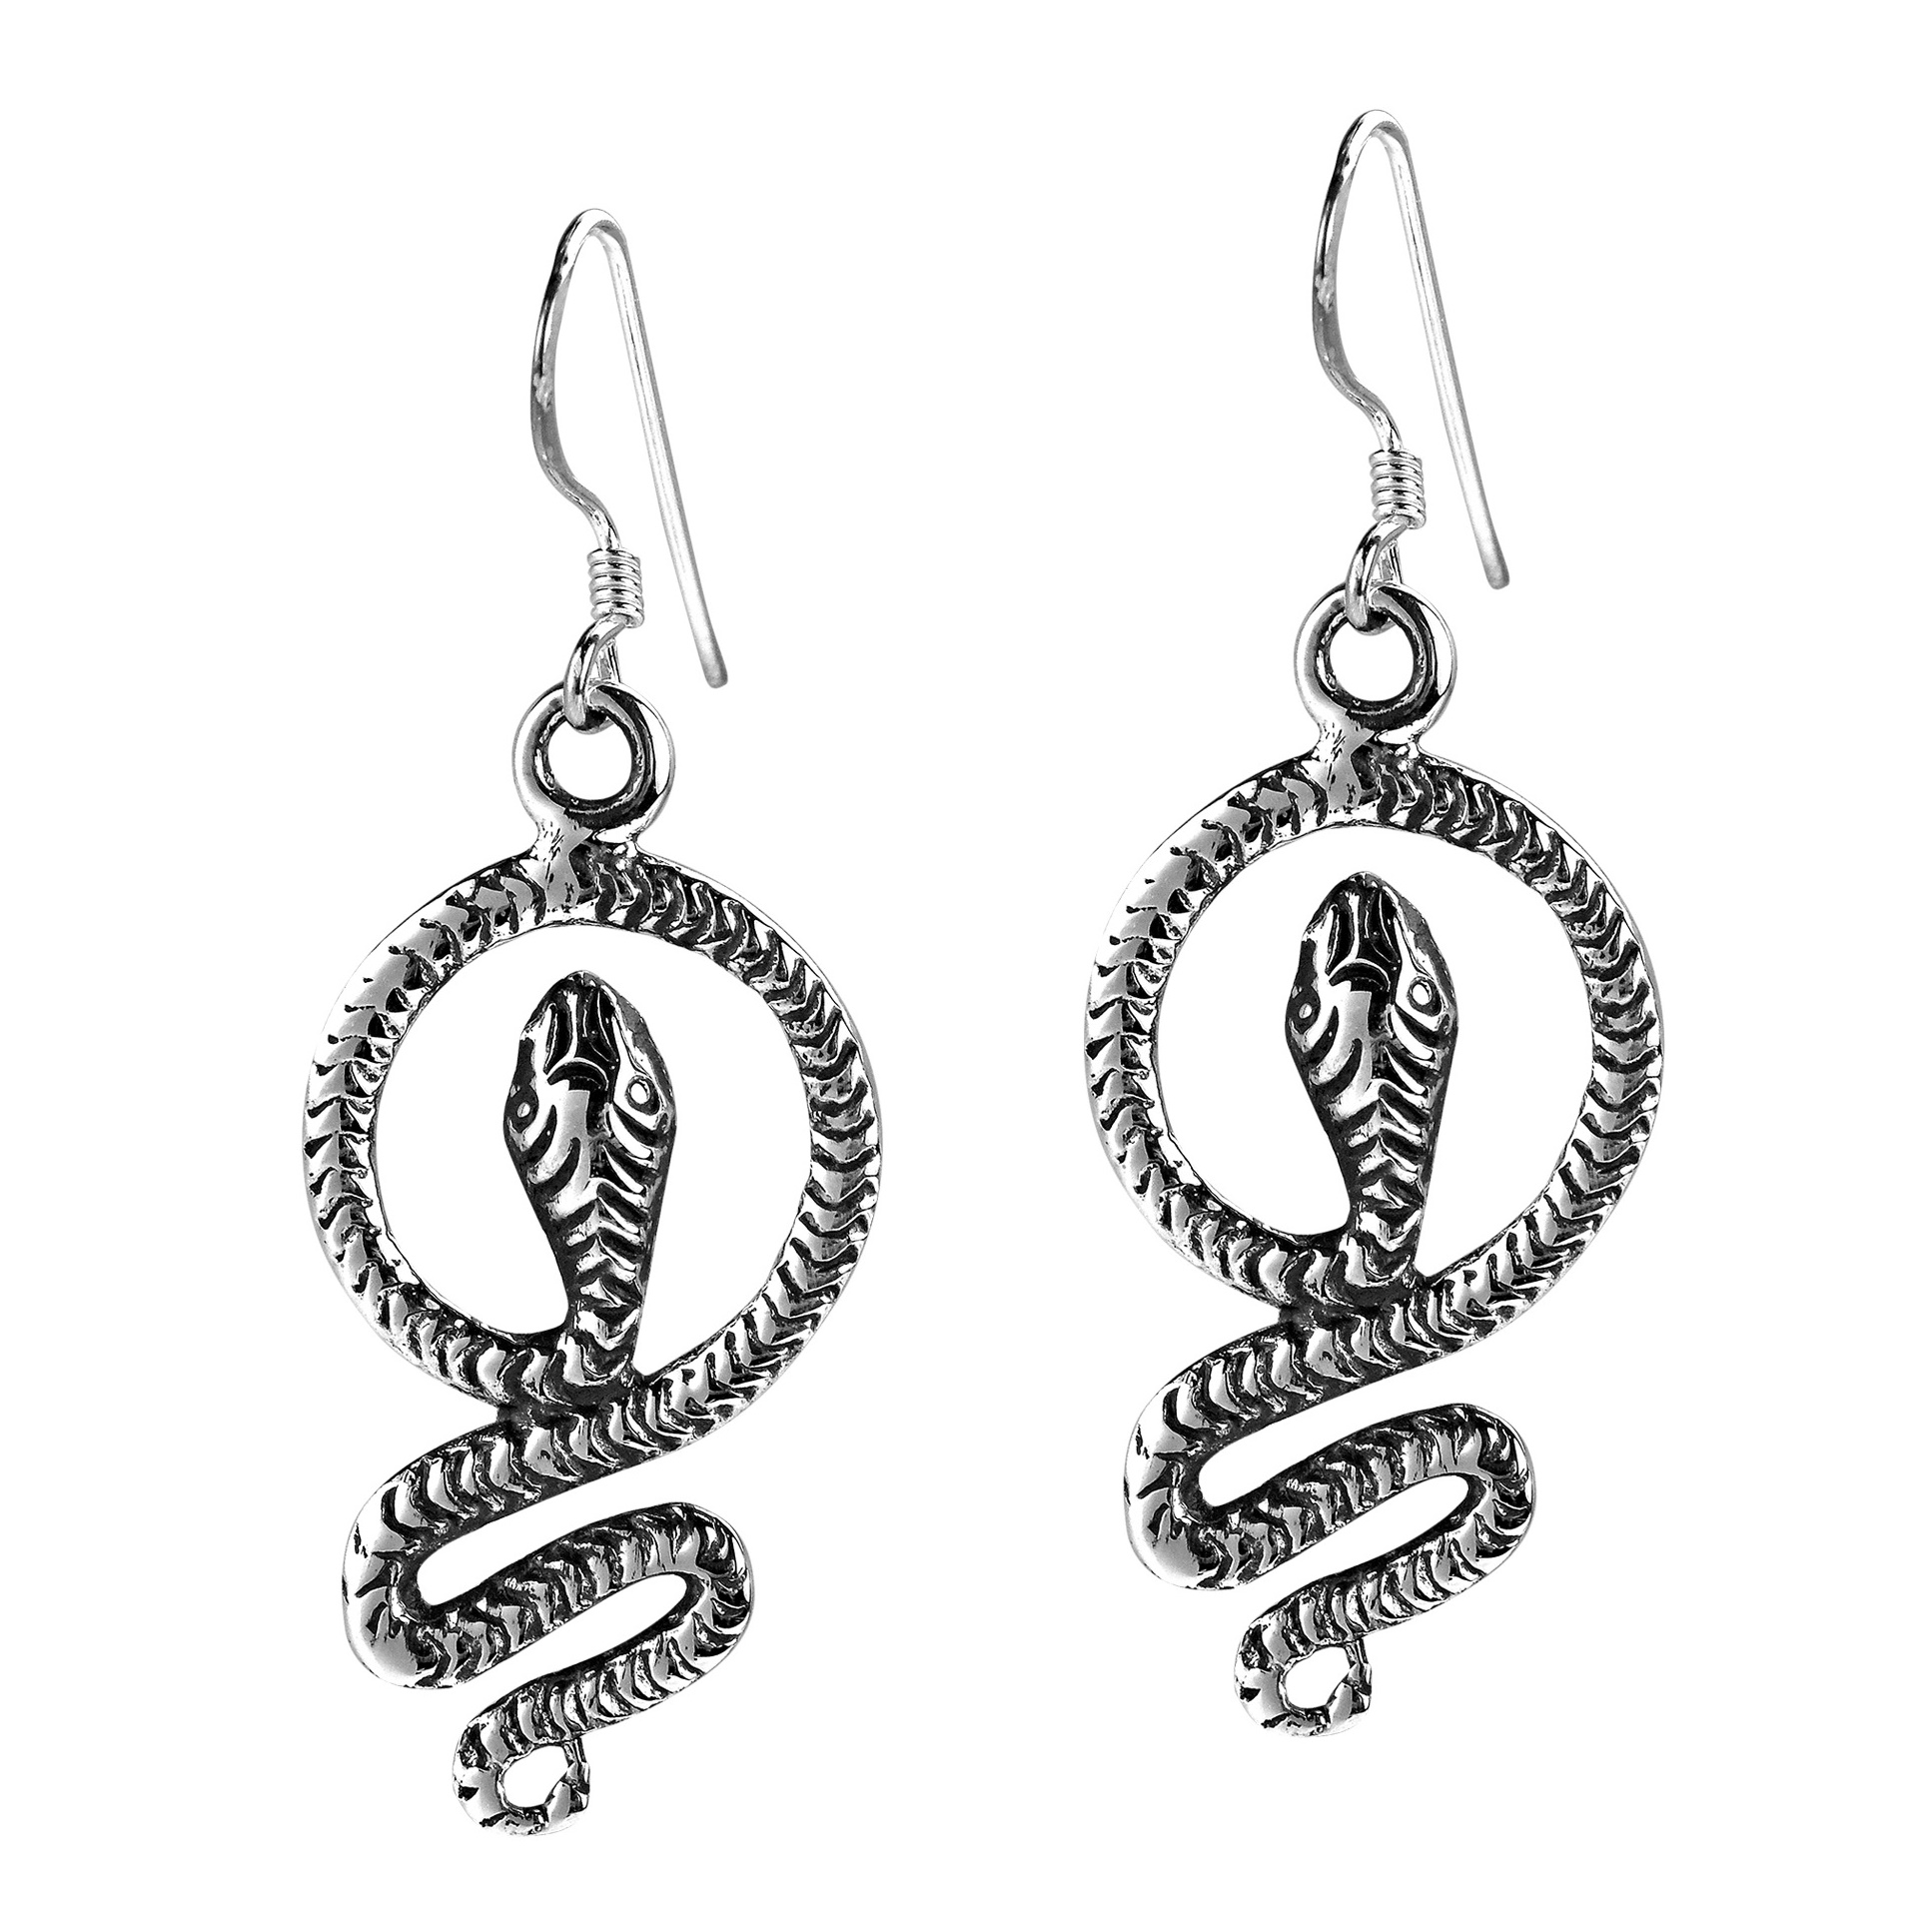 Vintage Serpent  925 Sterling Silver Snake Dangle Earrings - AeraVida